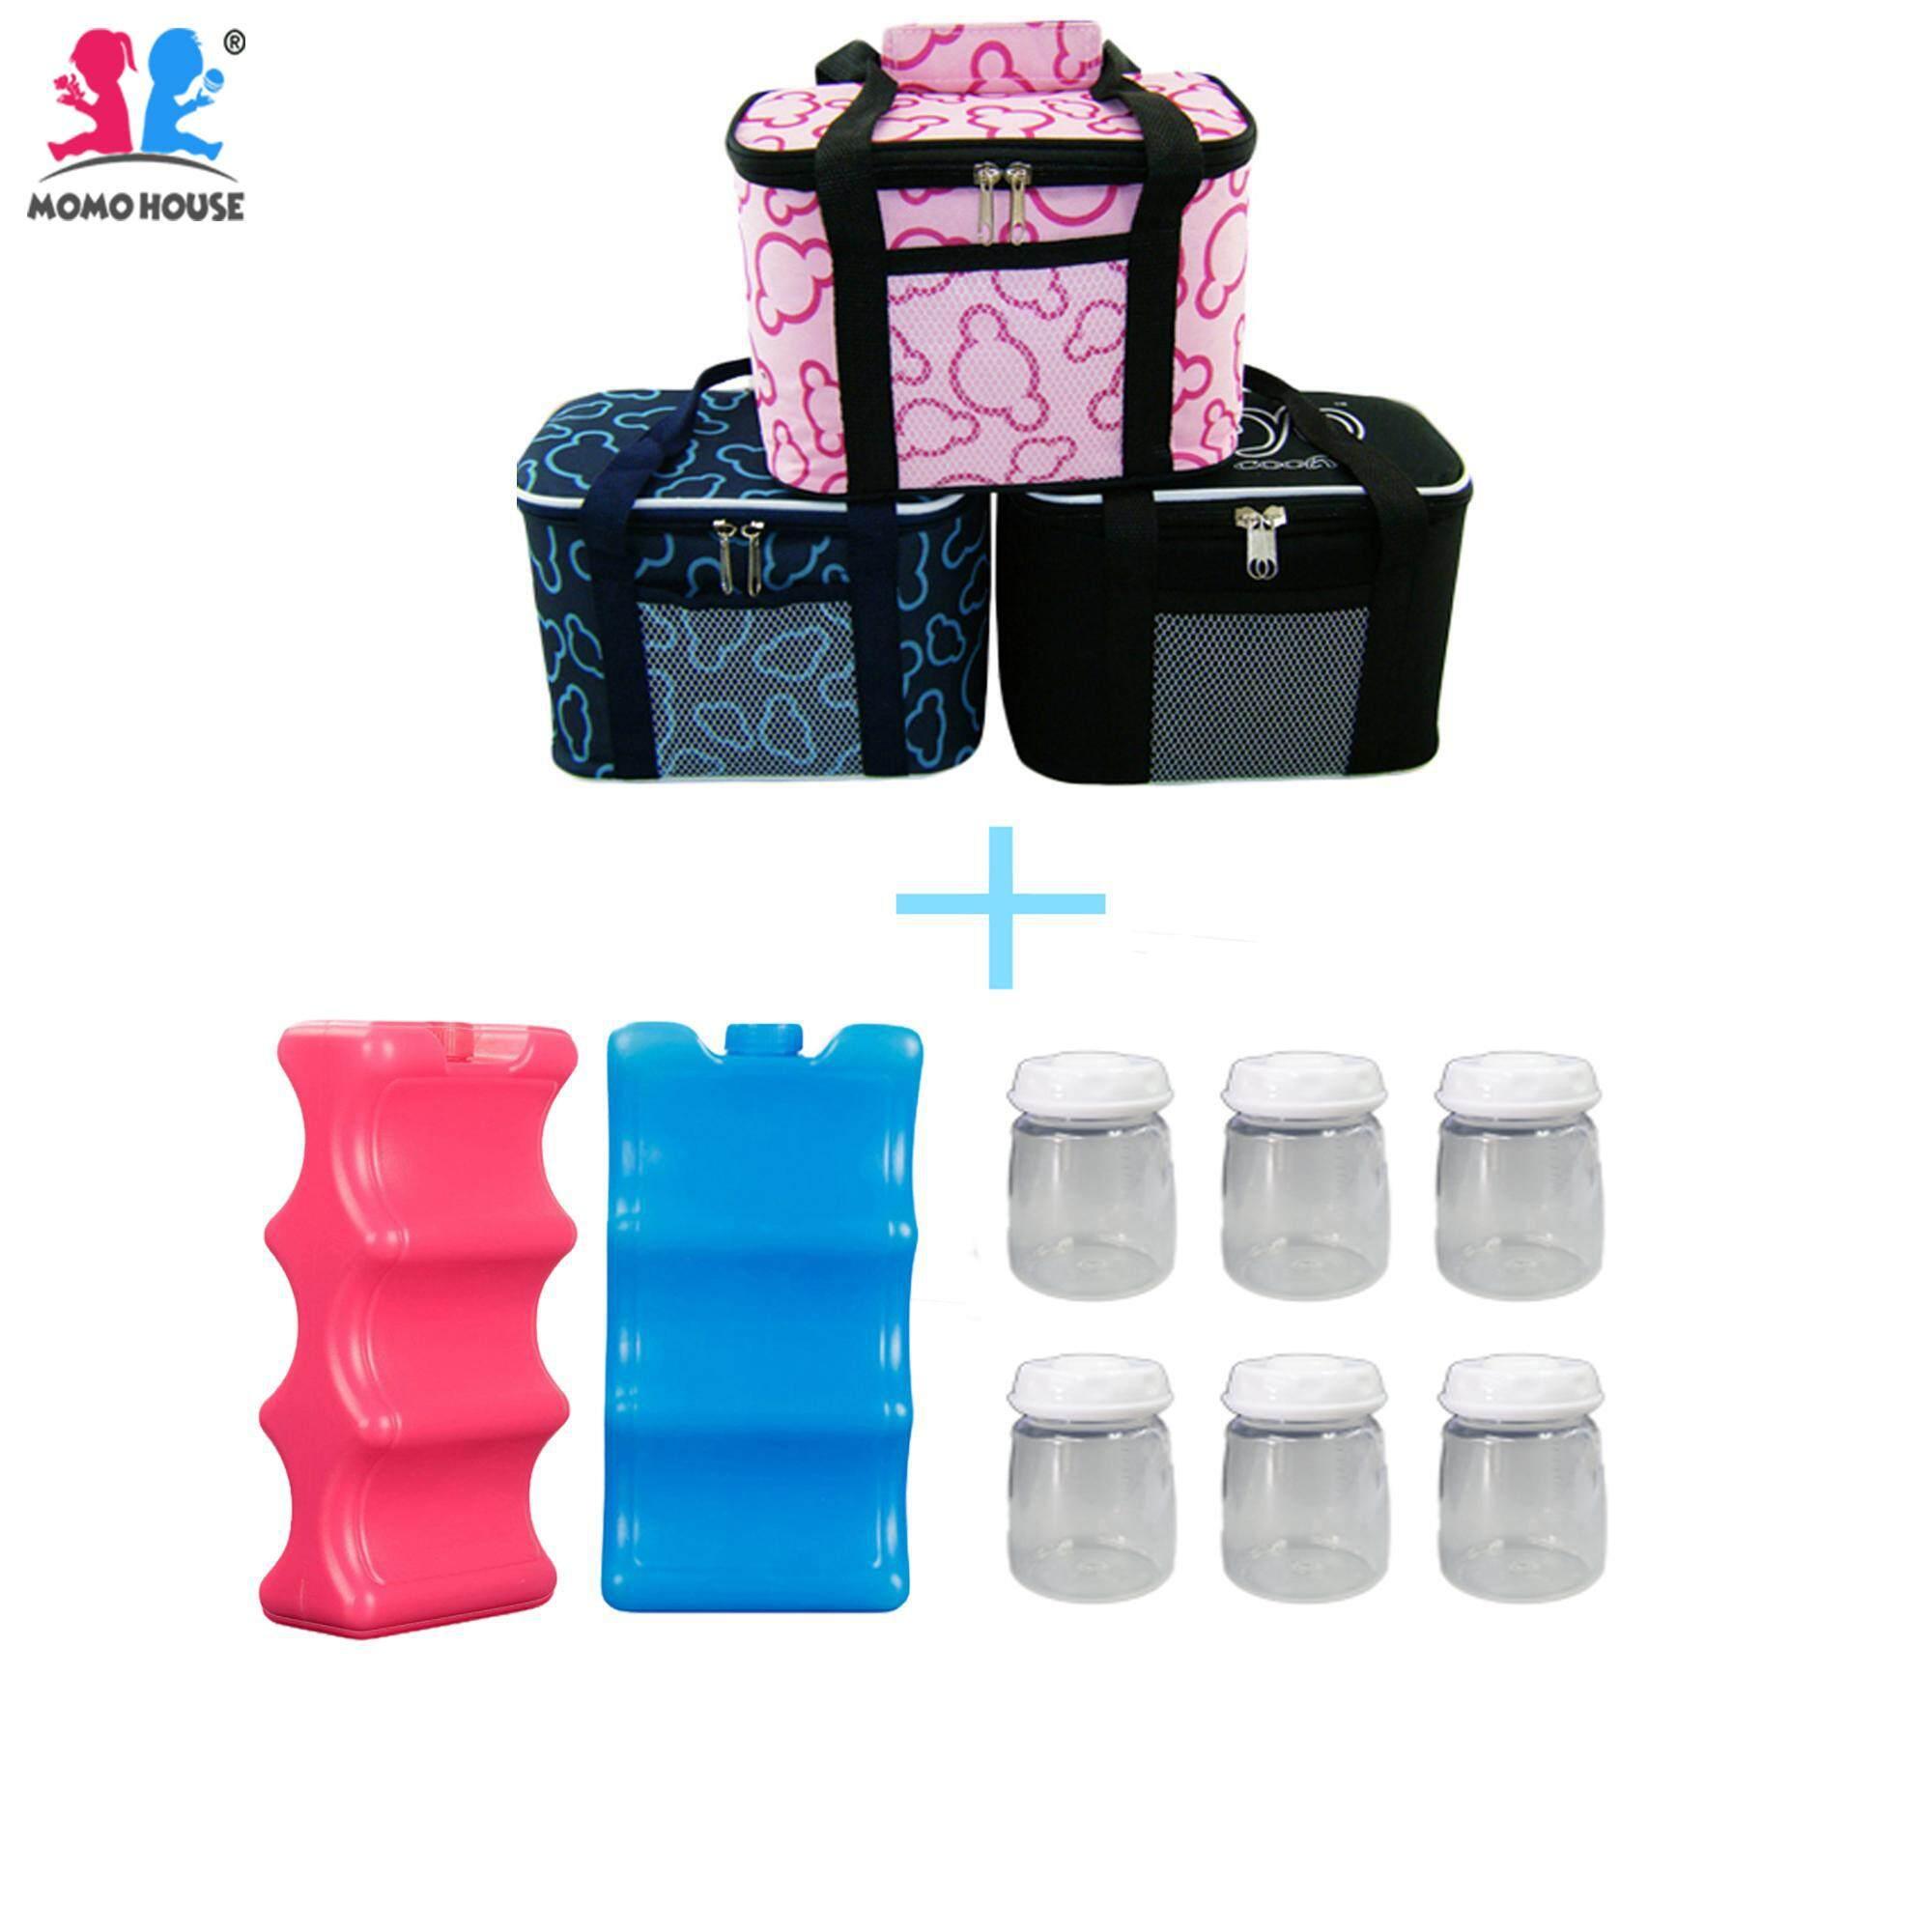 MOMO HOUSE Foldable Breast Milk Storage Bag Cooler Bag + Ice Brick + Storage Bottle COMBO